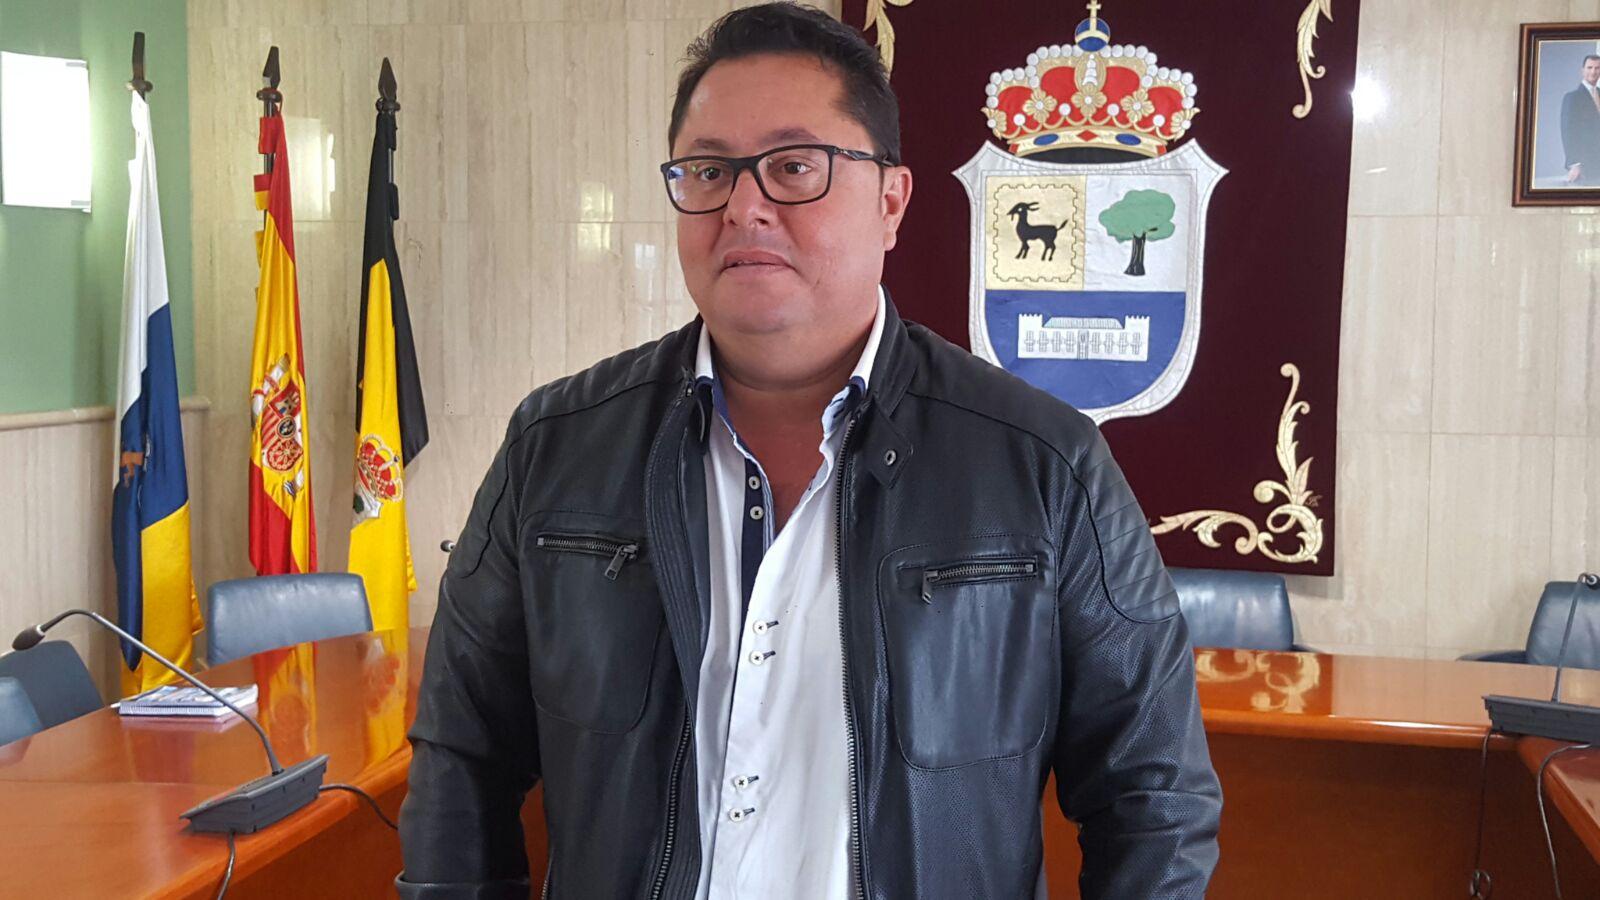 Marcelino Umpiérrez